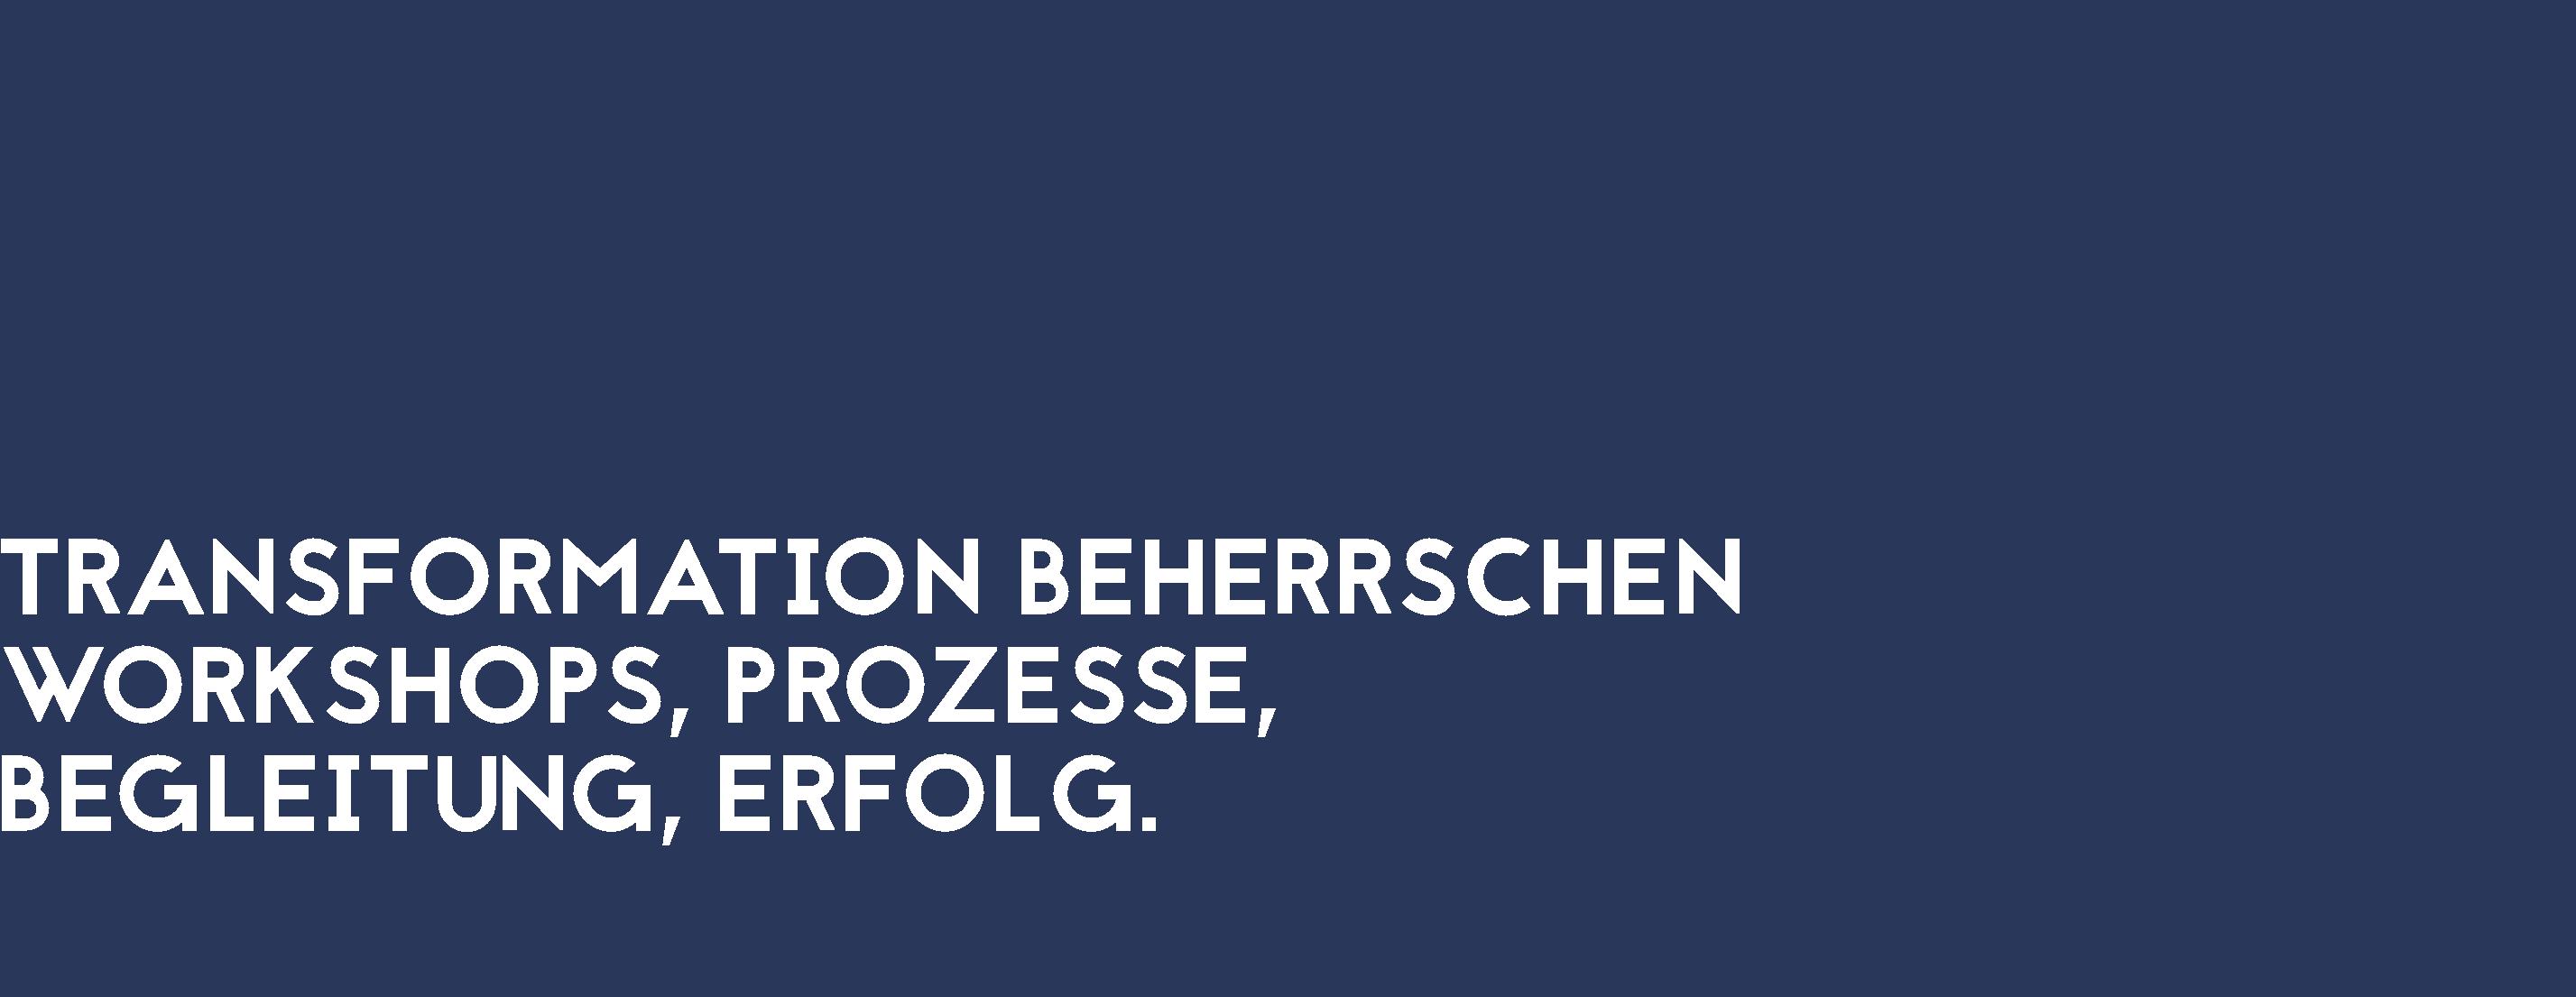 Header_Transformation_de_neu.png